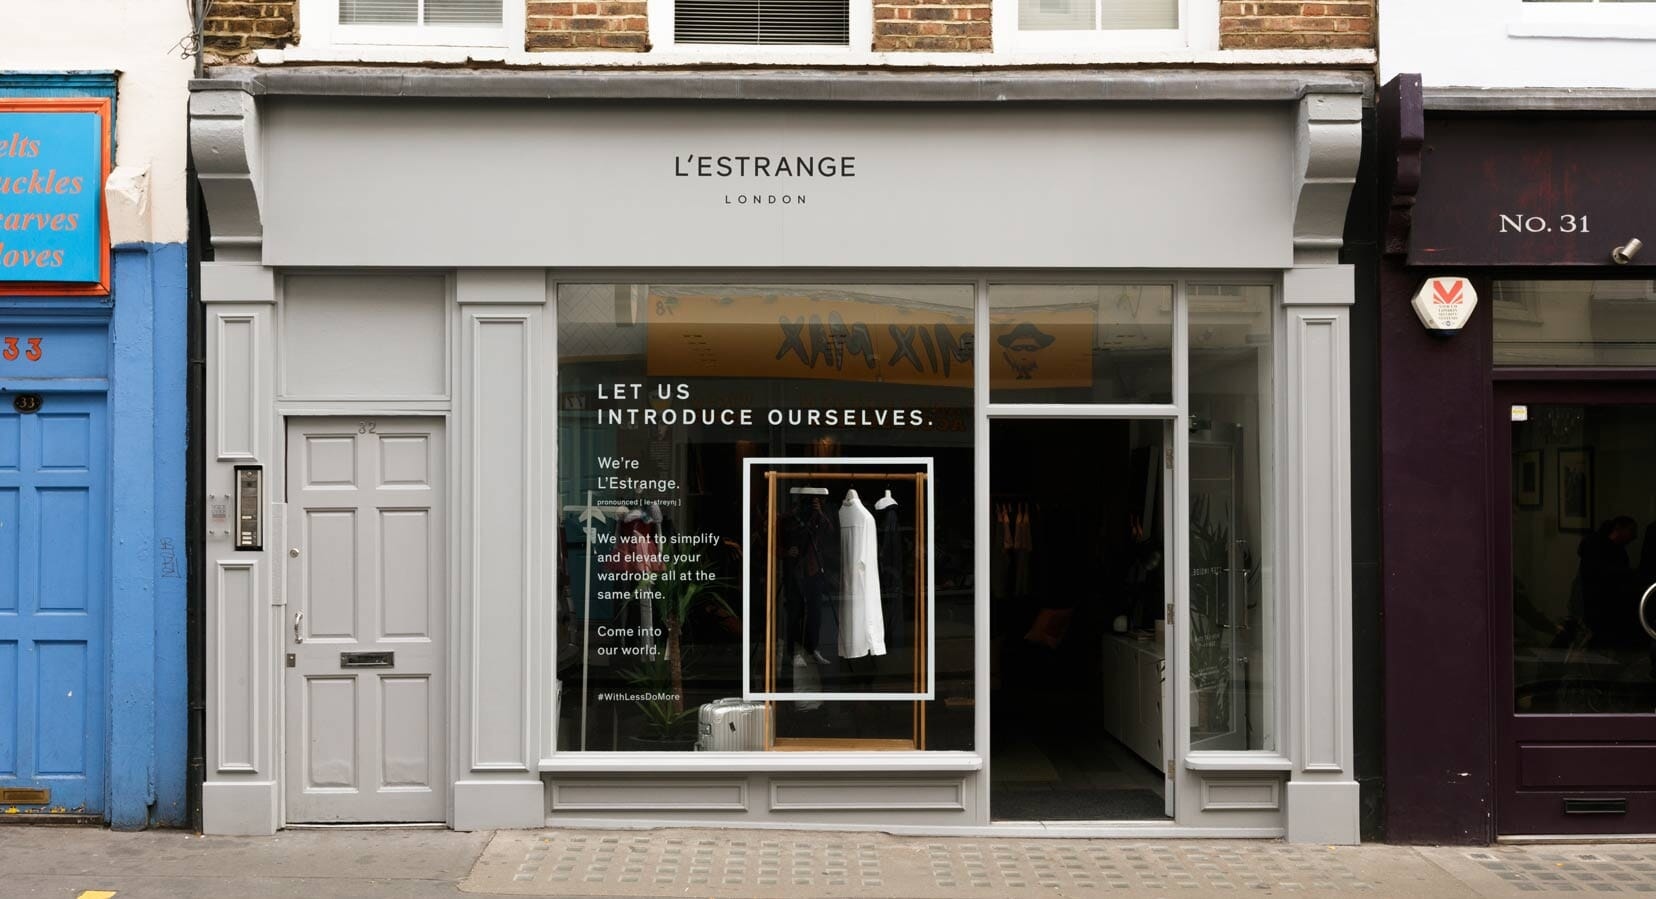 Take A Look Inside The L'Estrange Apartment